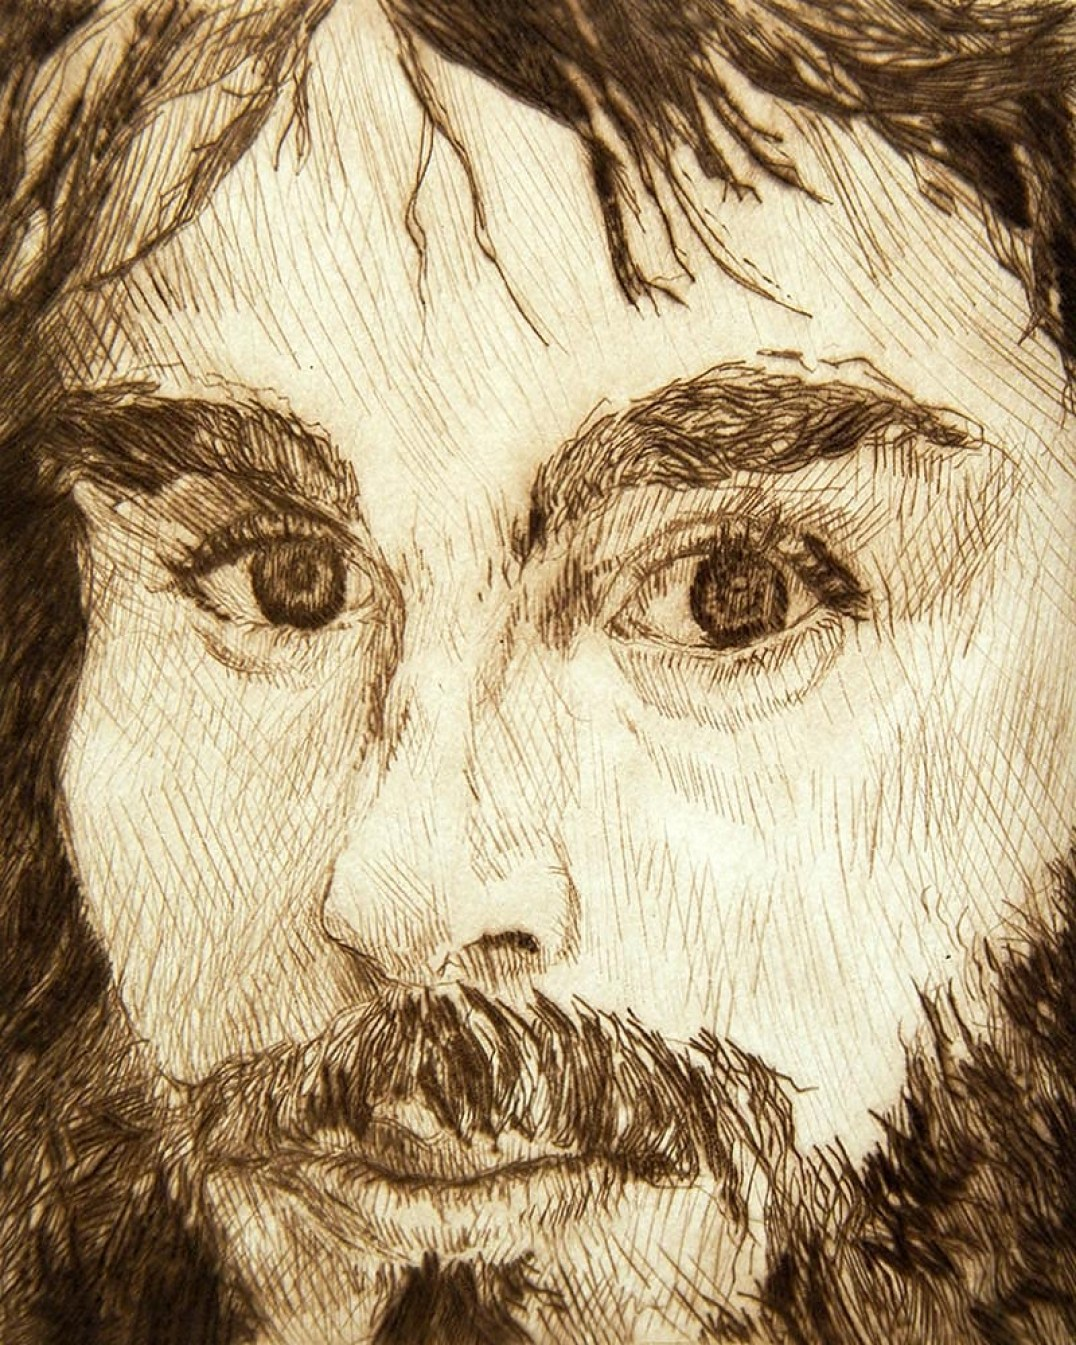 Self Portrait, drypoint